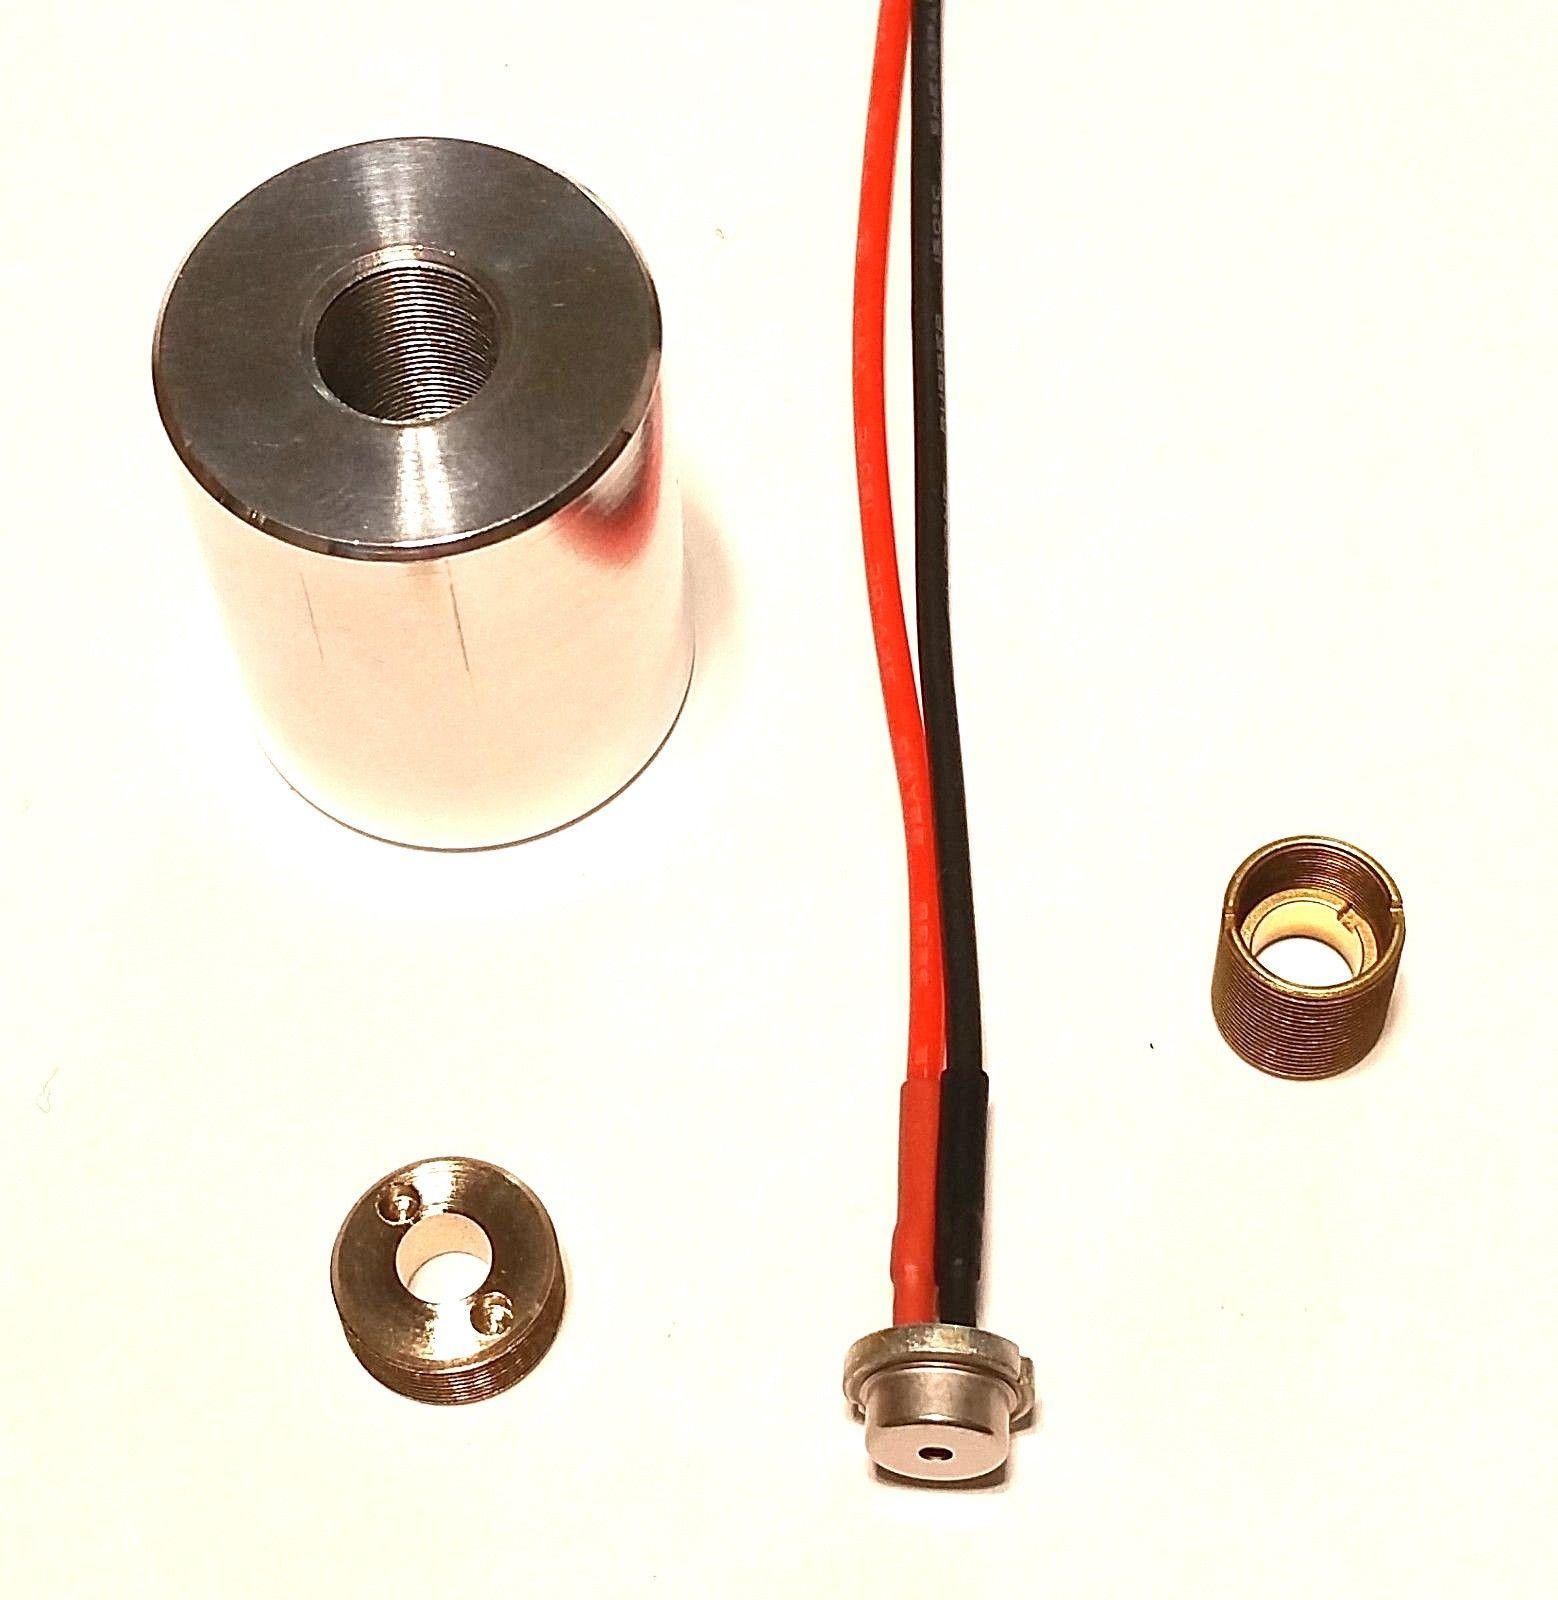 Tout Nouveau Nichia NUBM44 7W 450nm Laser and 50 similar items